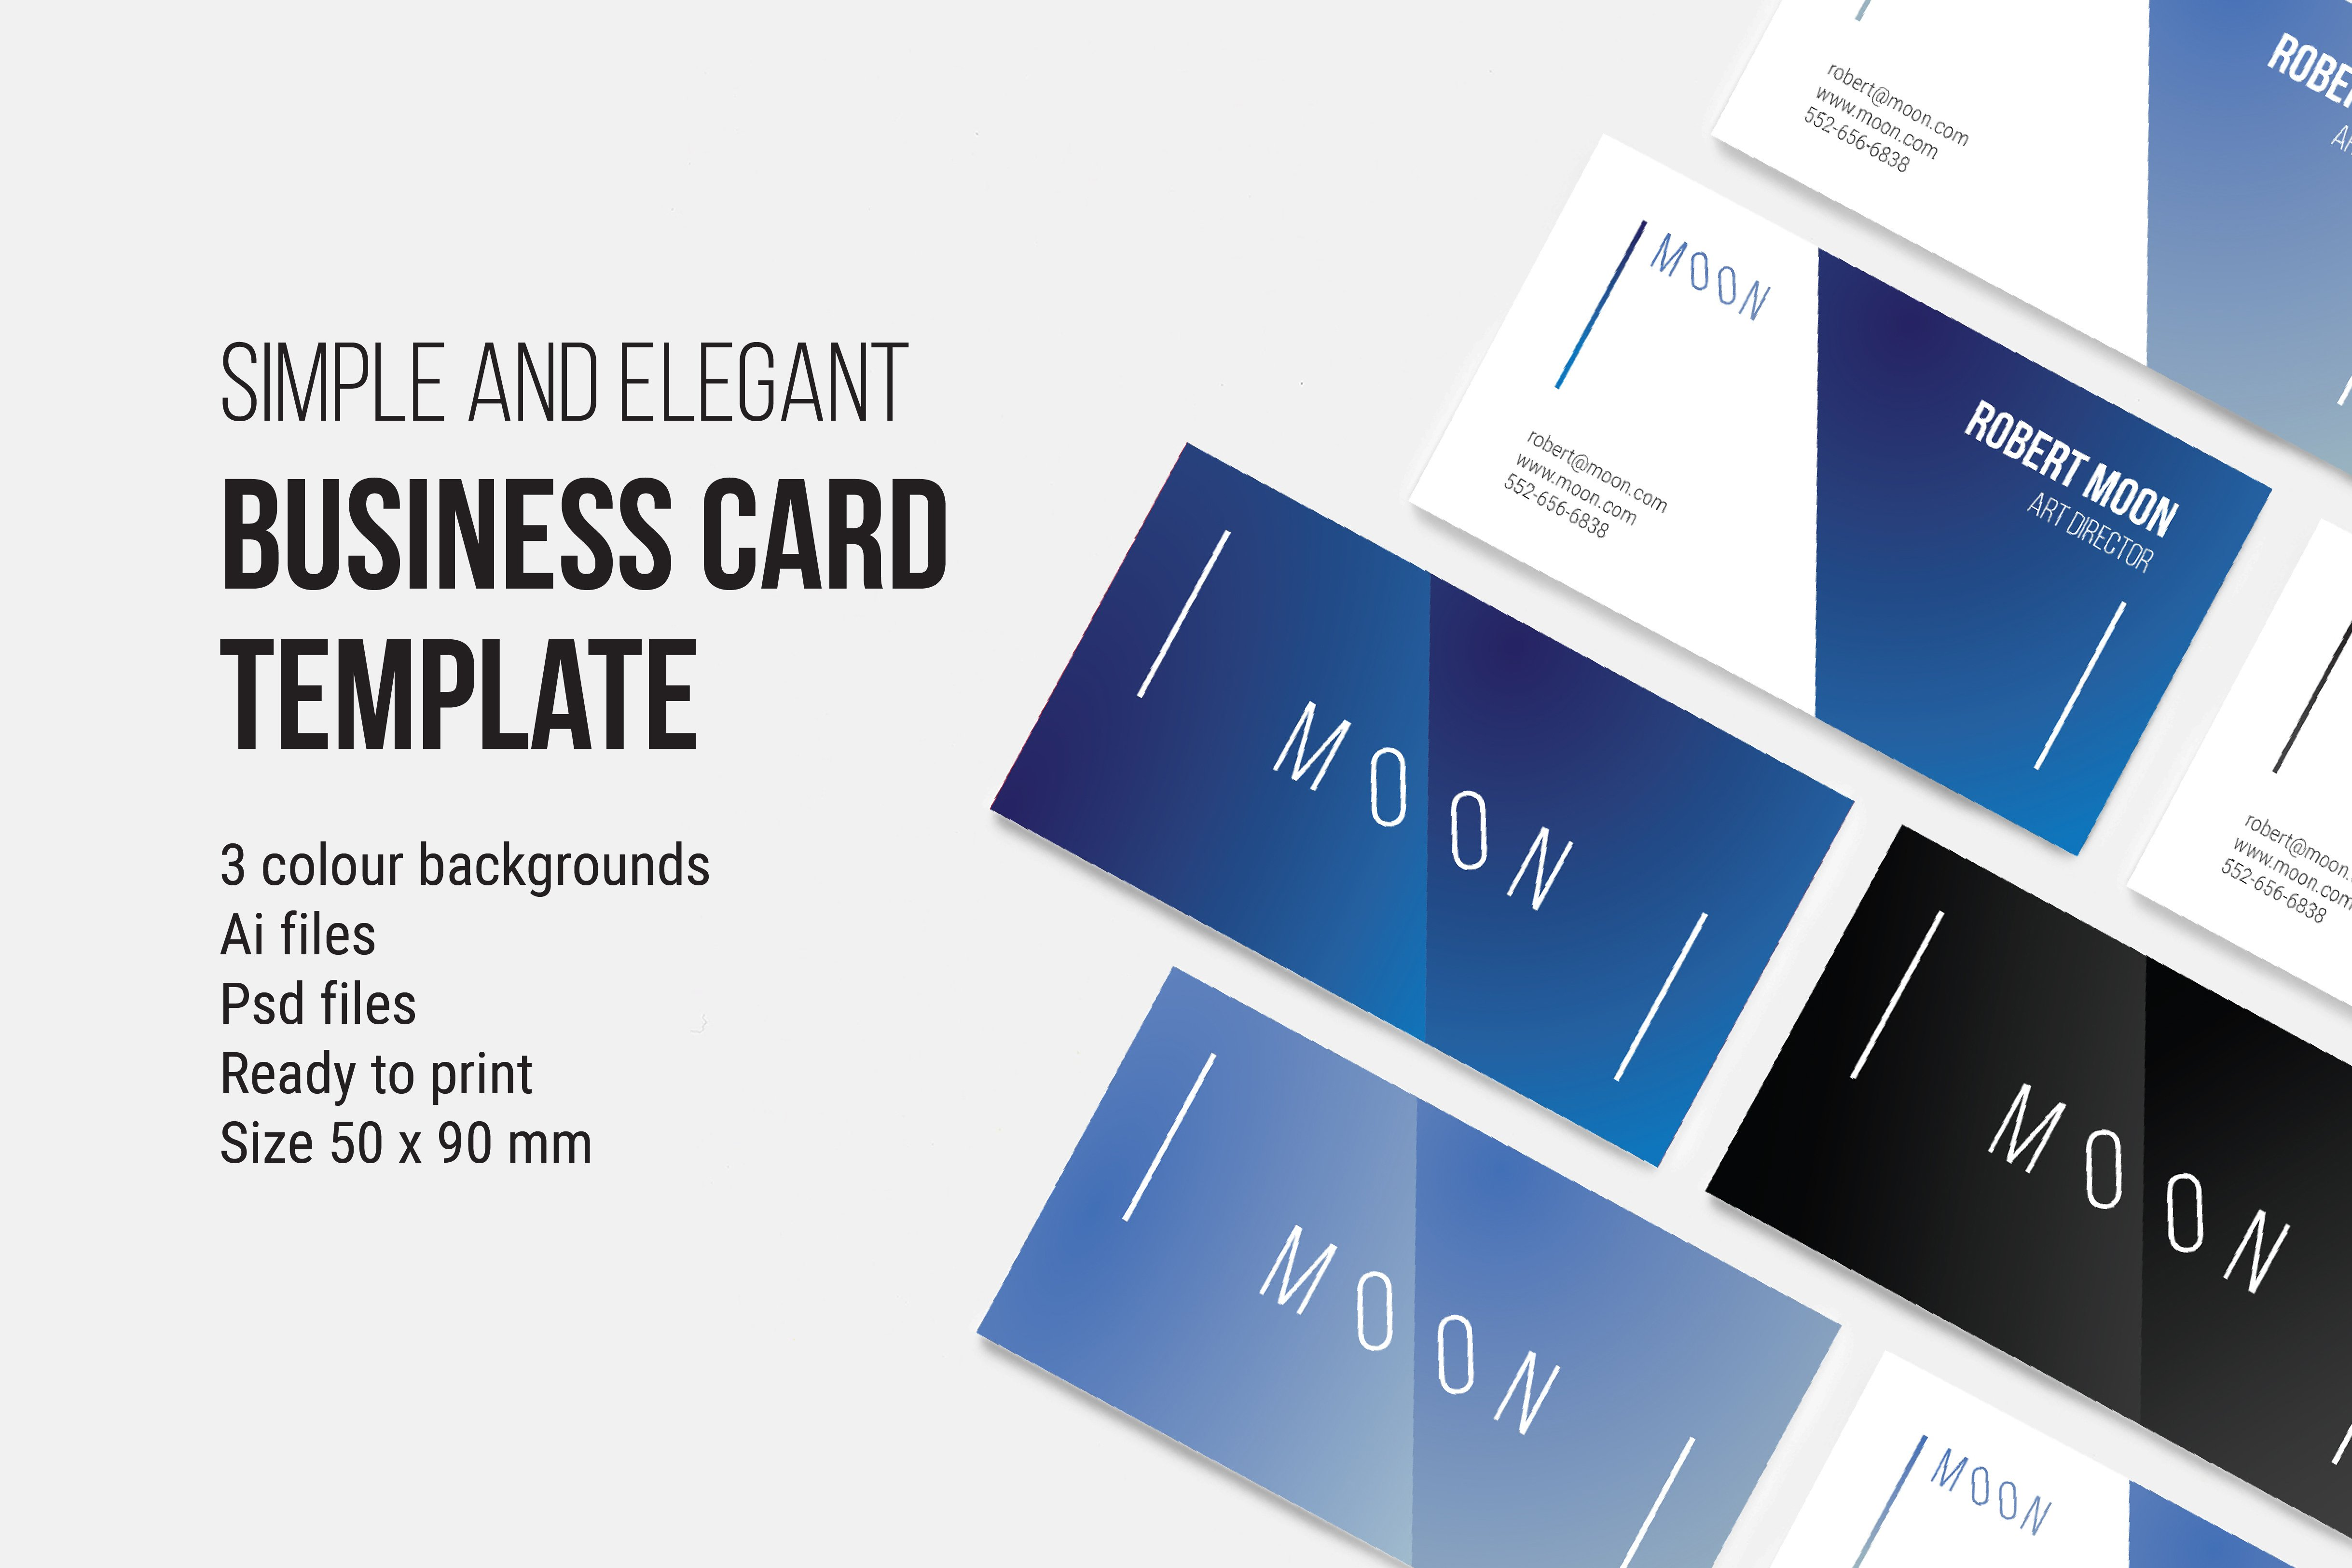 Moon business card temmplate business card templates creative market colourmoves